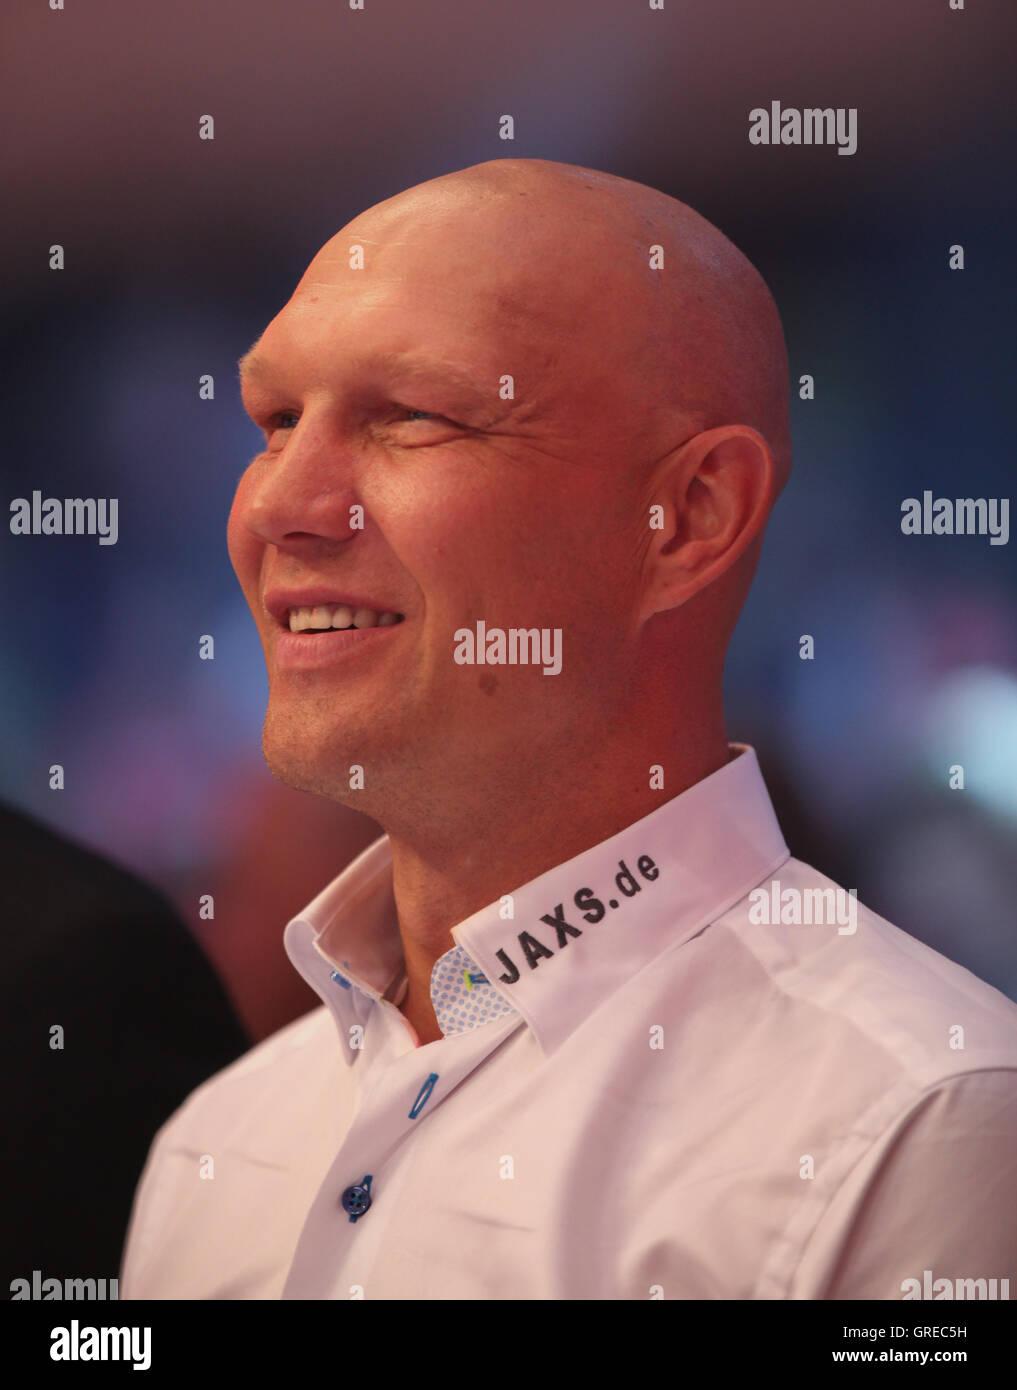 Axel Schulz The Wba World Championship Fight Chagaev Vs. Pianeta On 11 July 2015 In Magdeburg - Stock Image